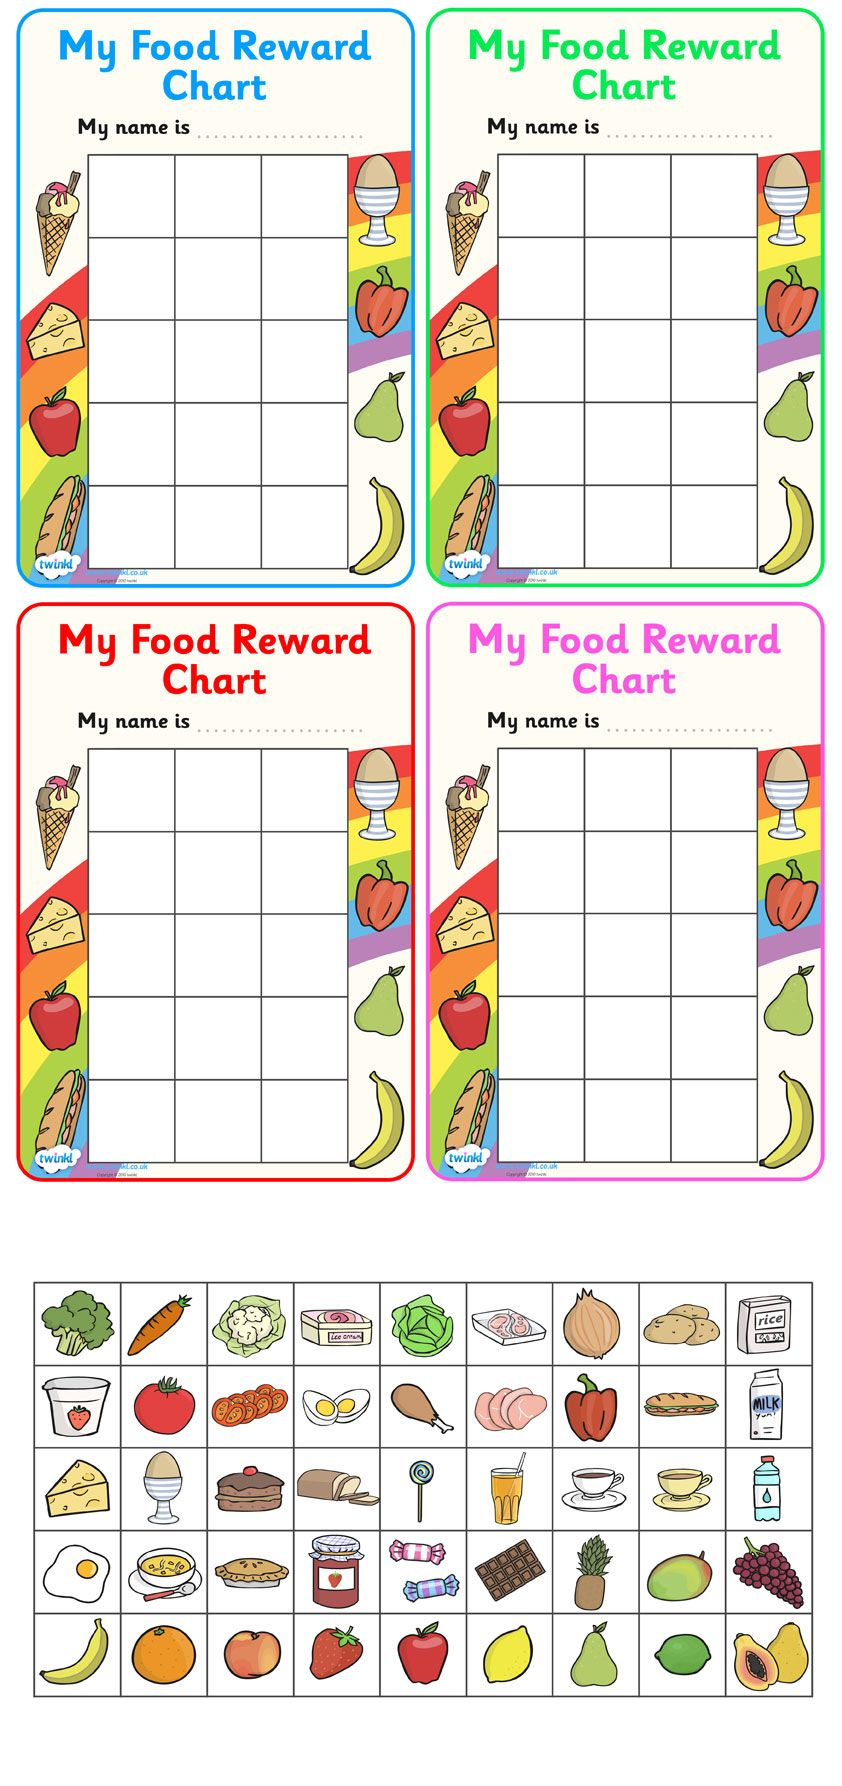 Twinkl Resources >> My Food Reward Chart >> Classroom